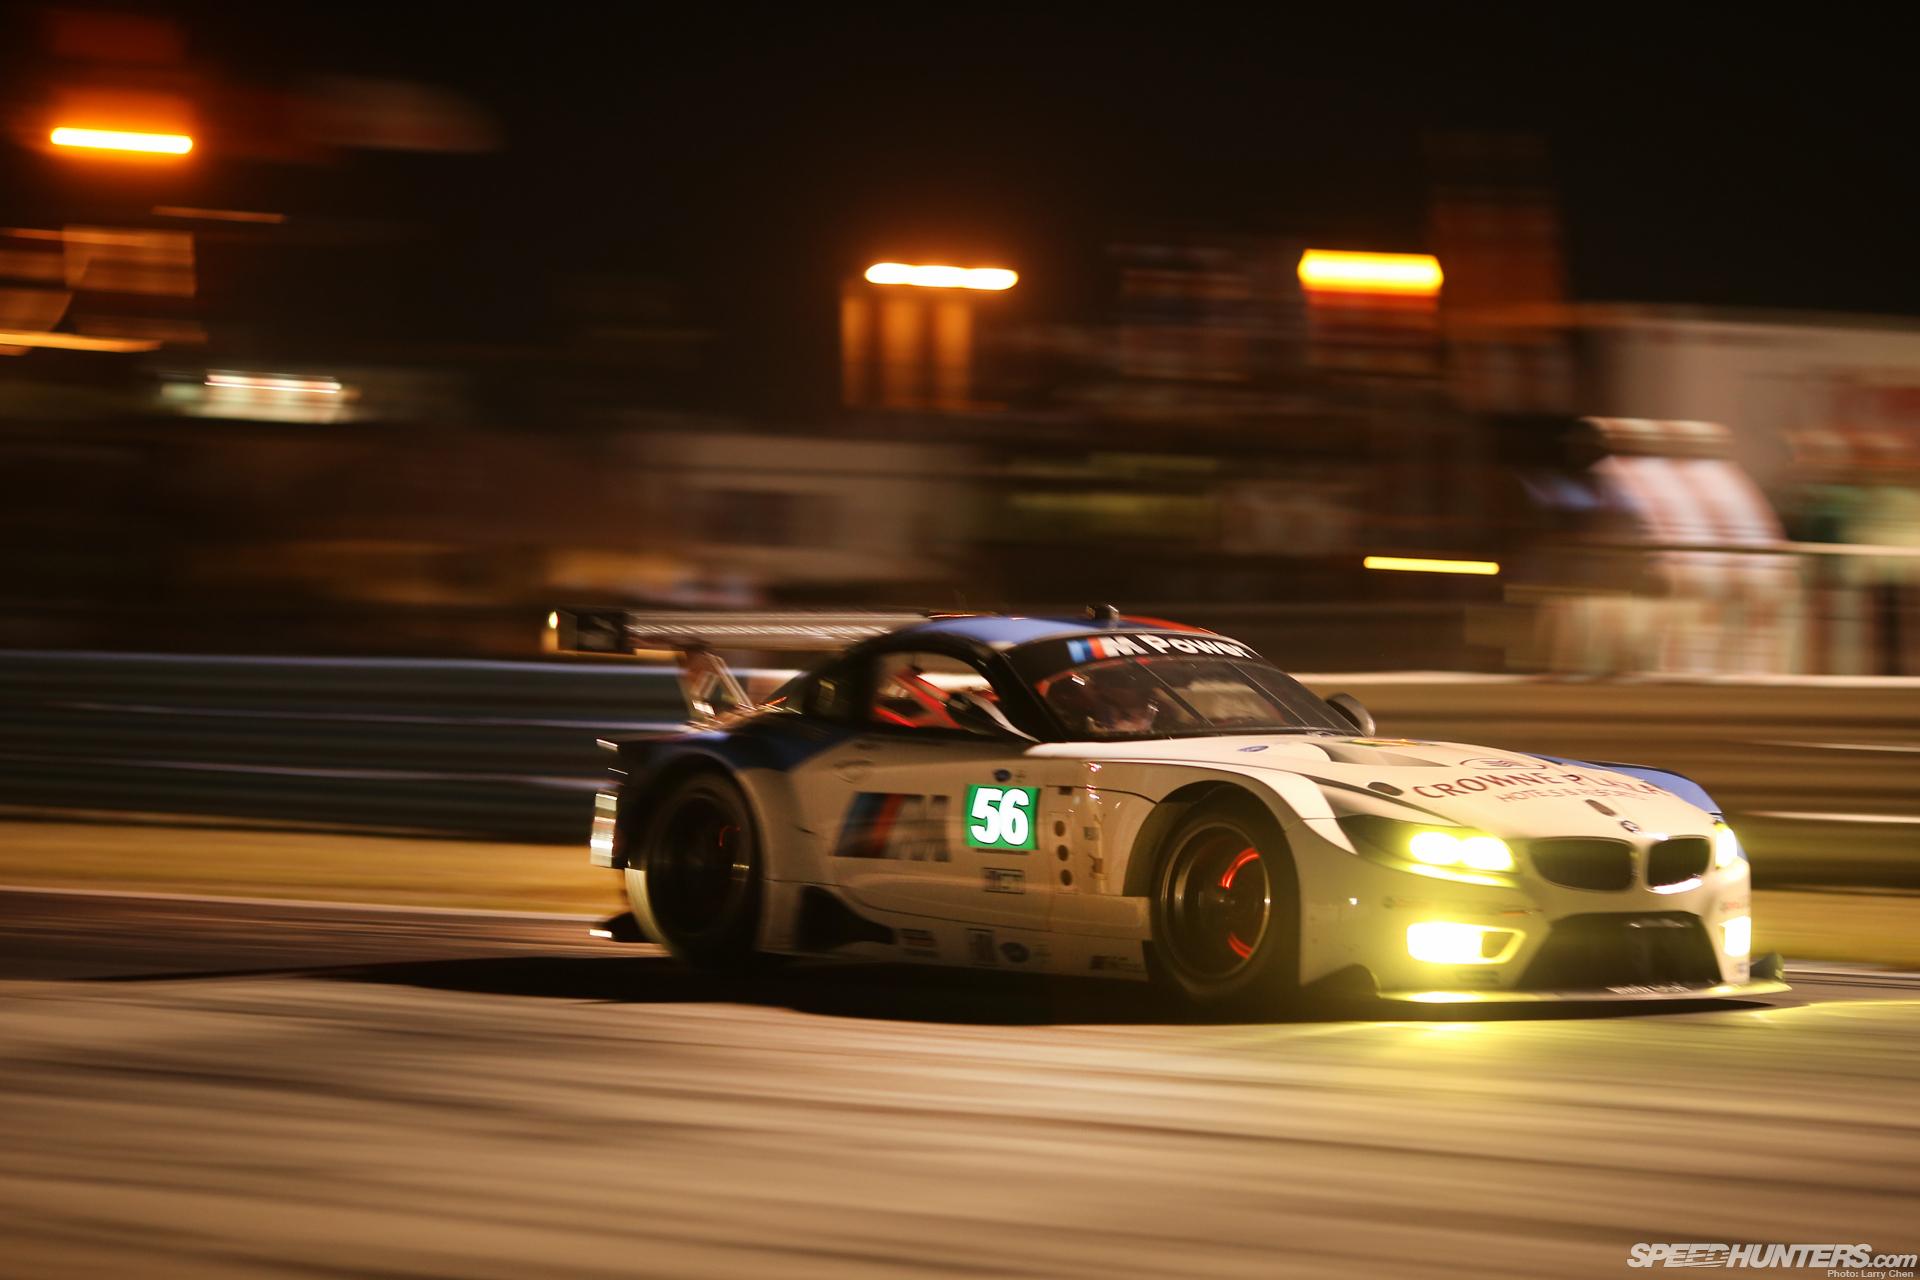 Bmw Z4 Race Car Glowing Brakes Motion Blur Night Racing